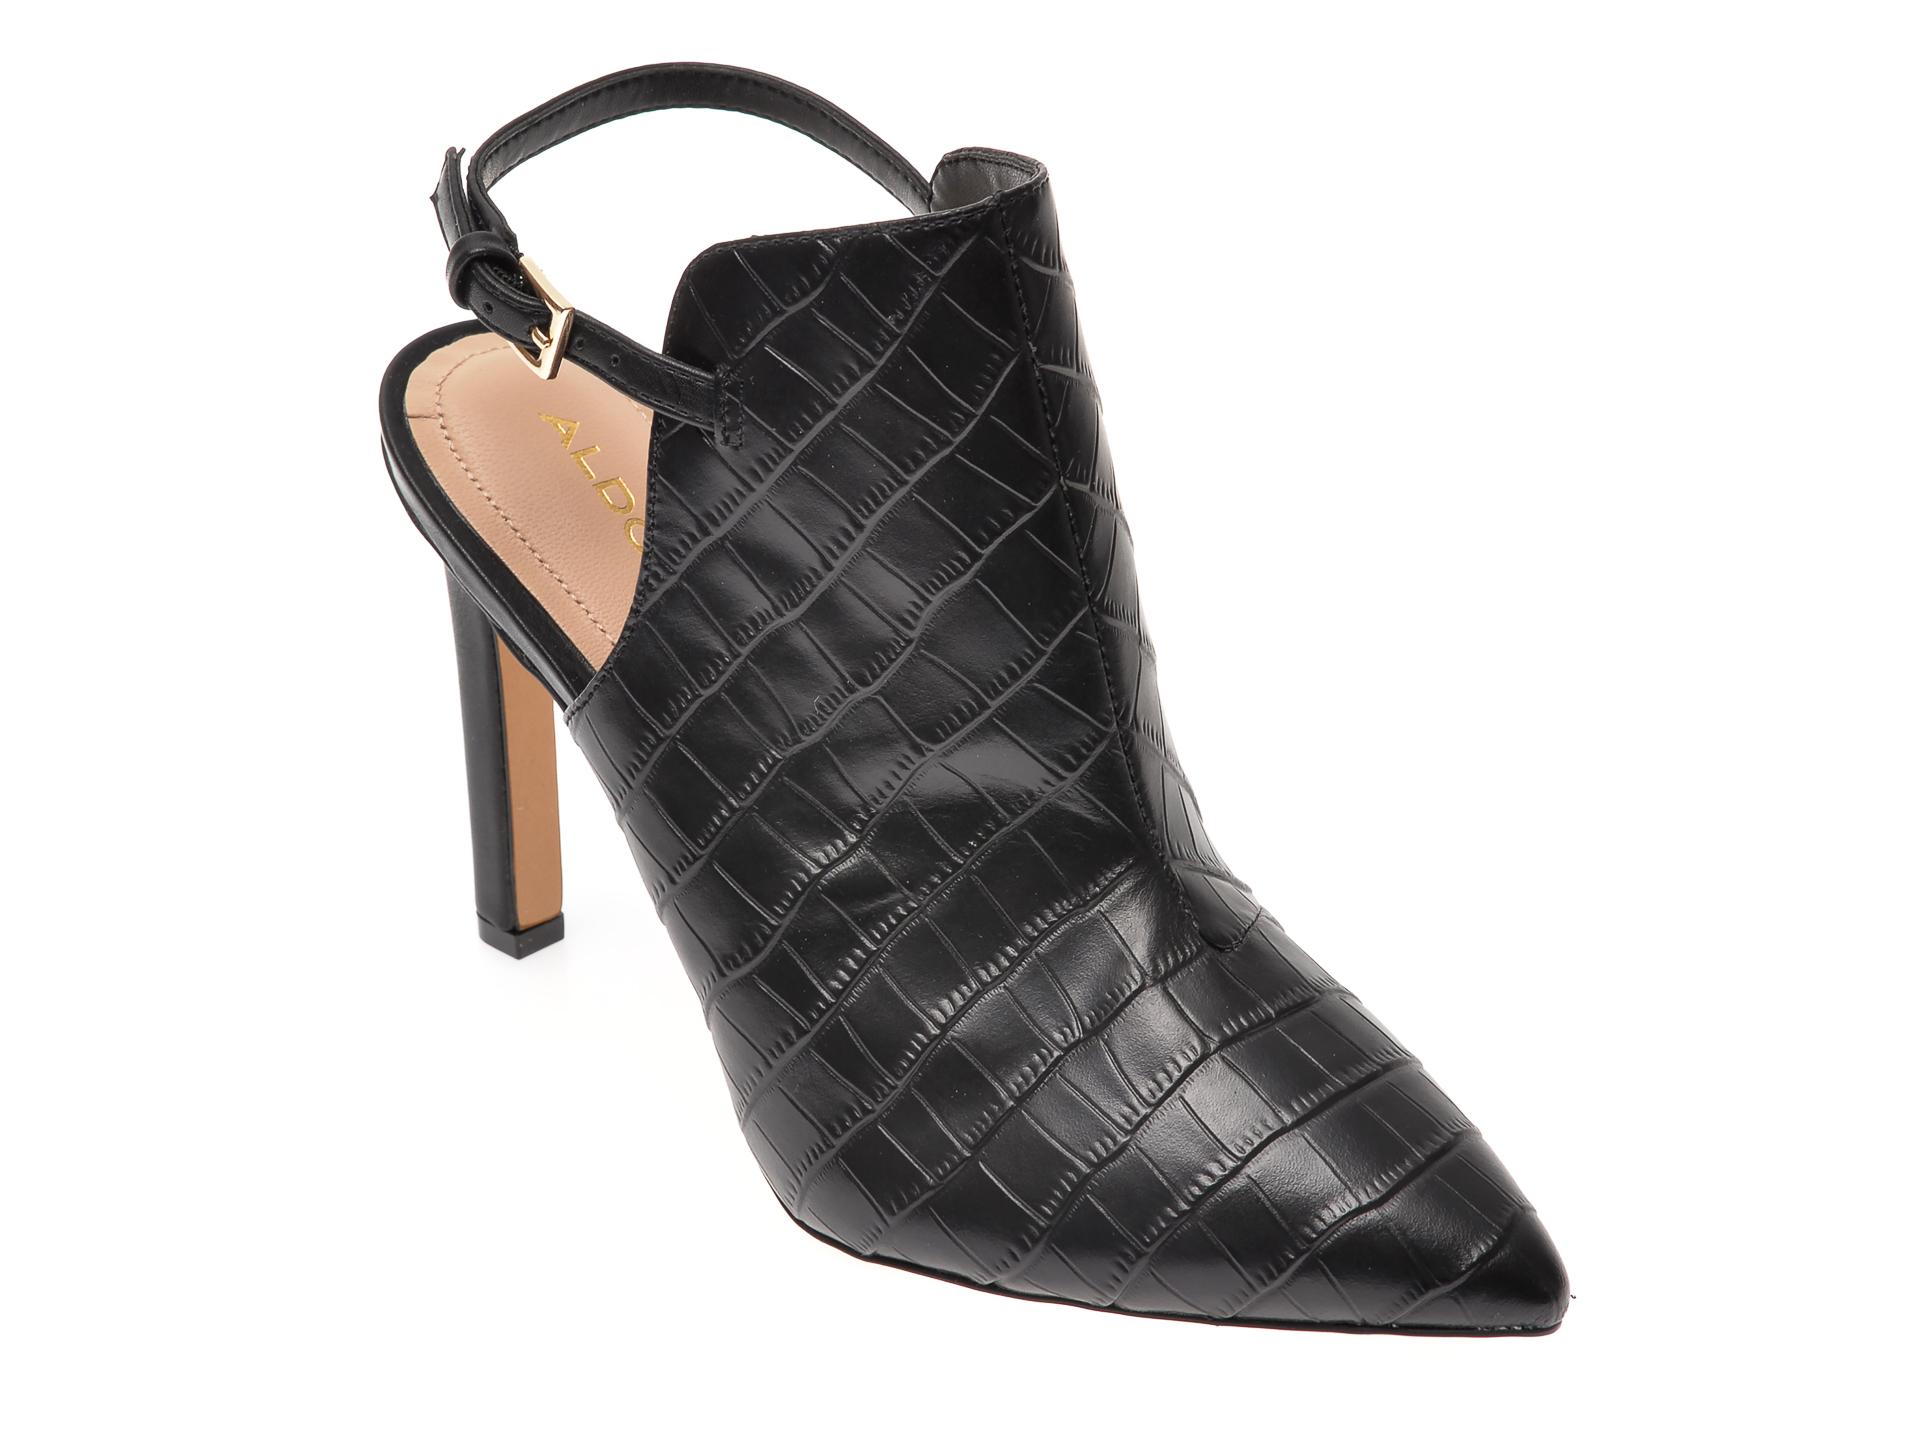 Pantofi ALDO negri, Firleigh007, din piele naturala imagine